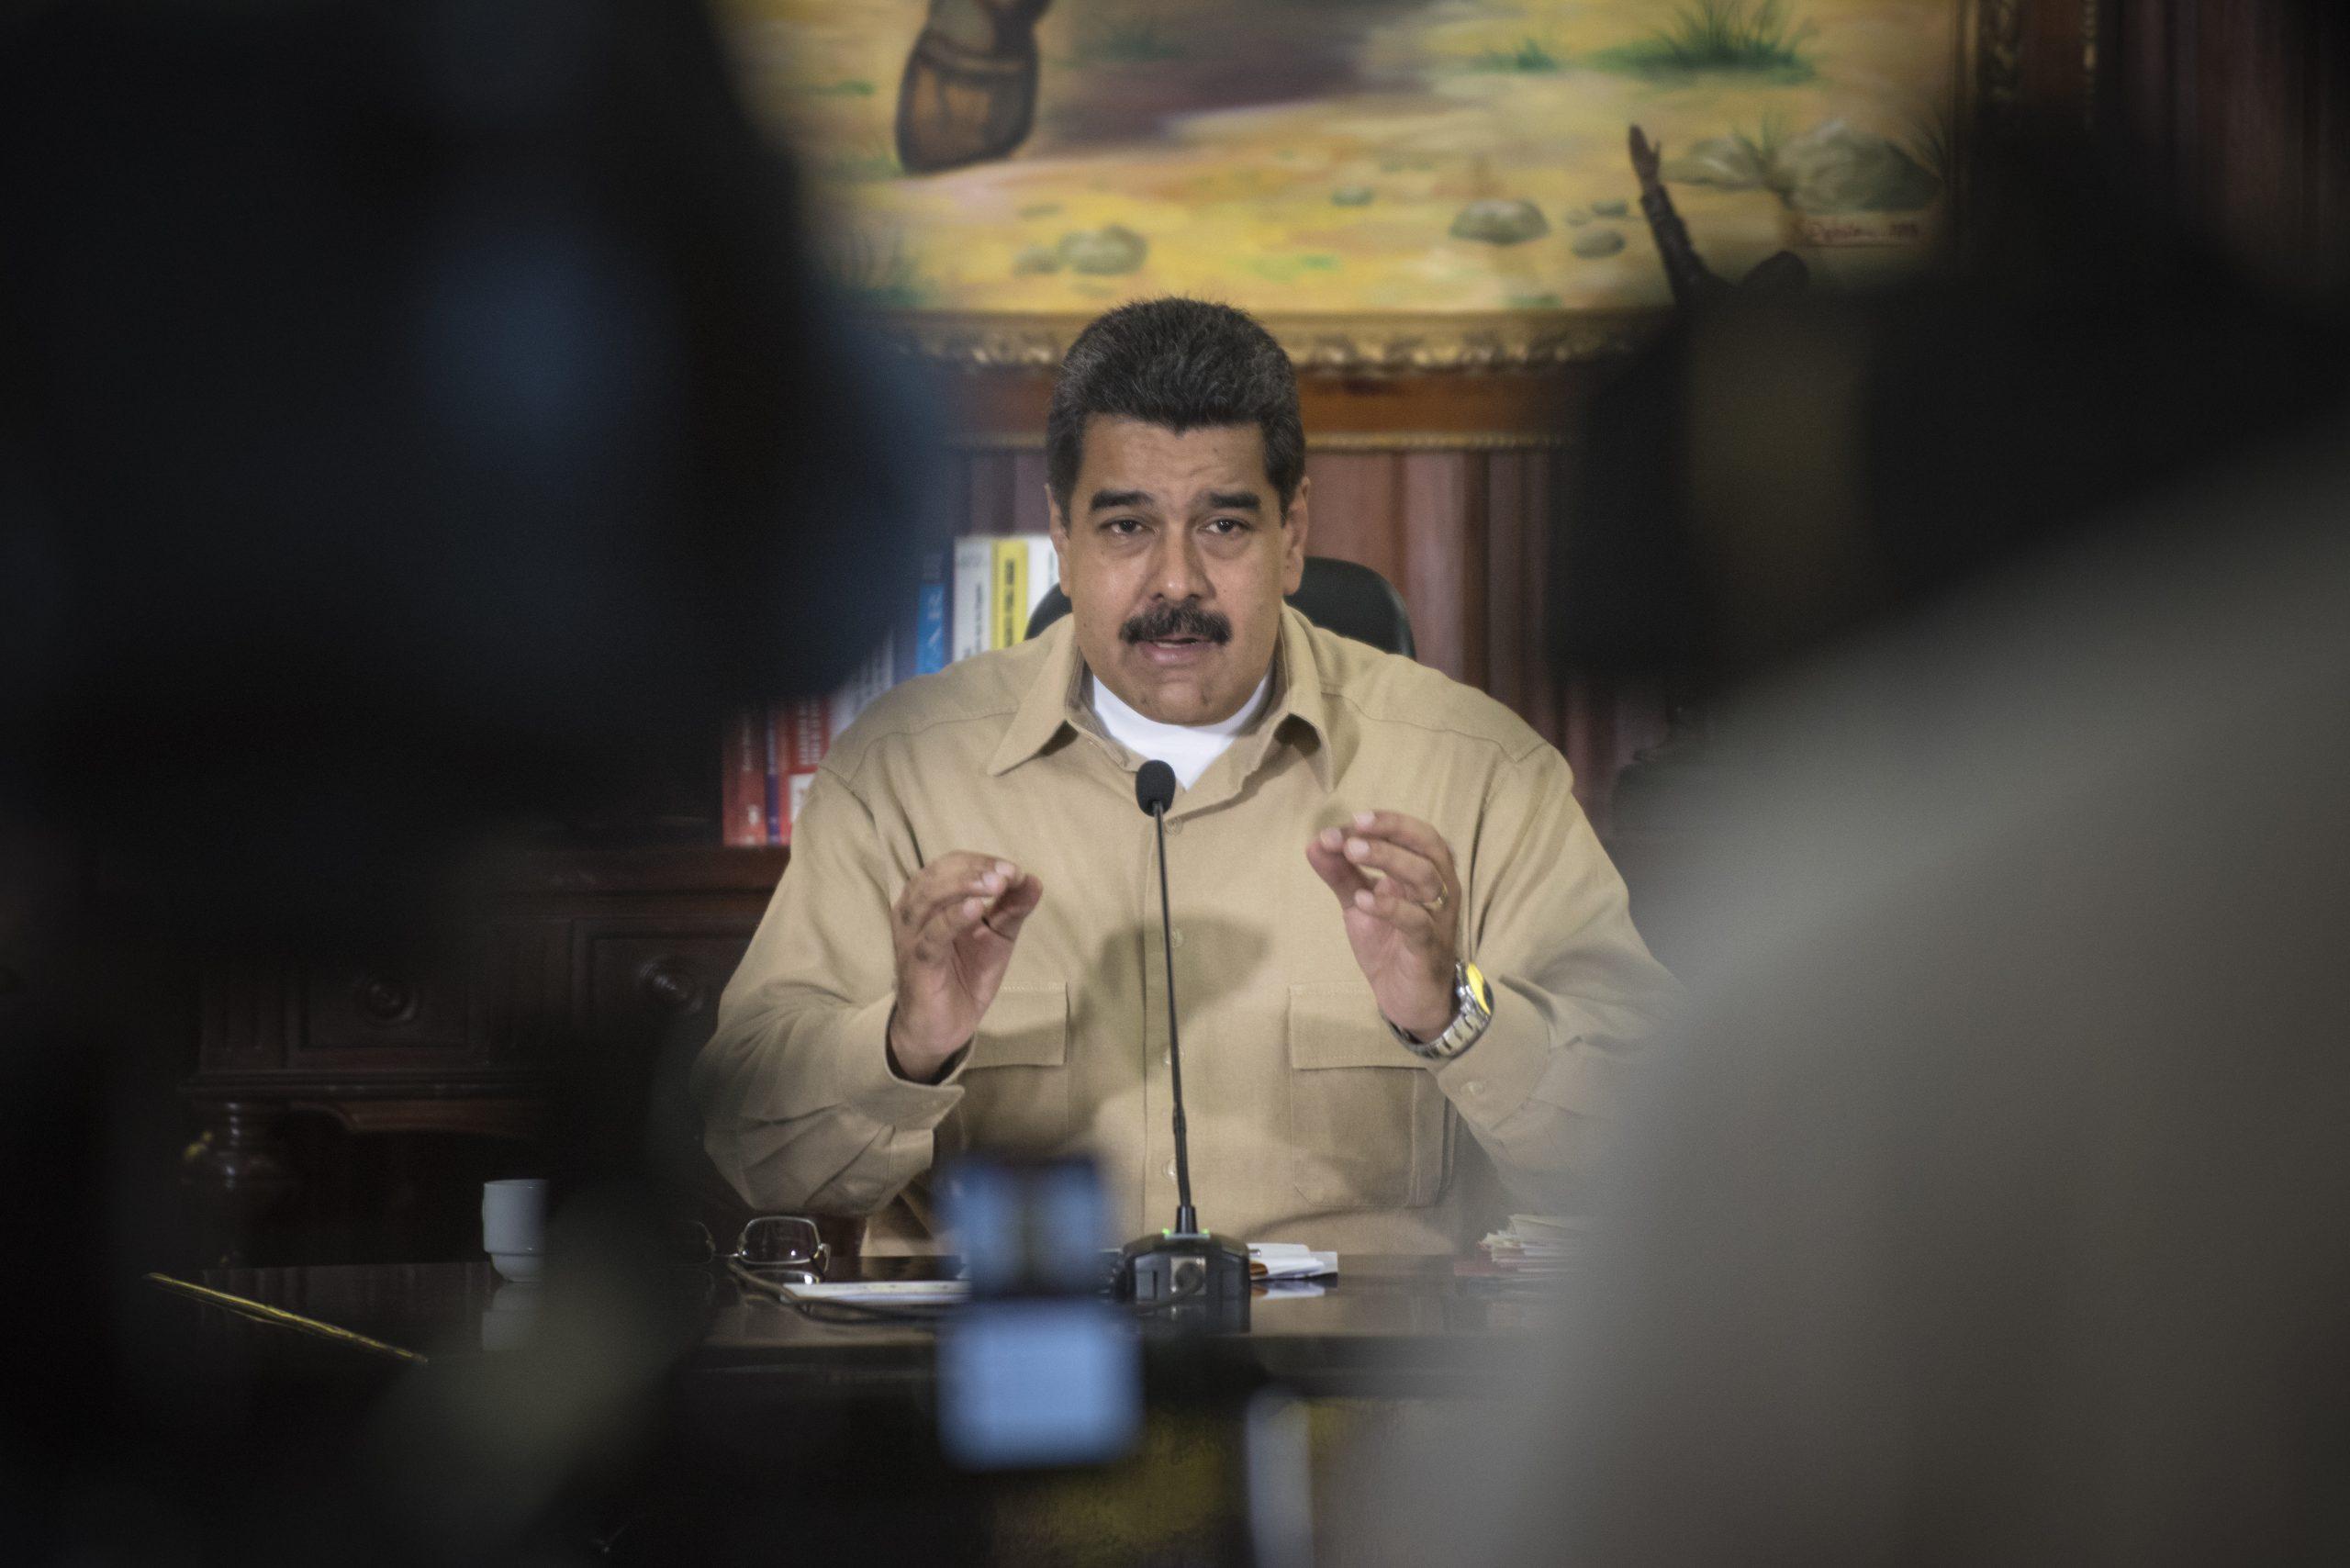 Digital Autocracy: Maduro's control of the Venezuelan information environment